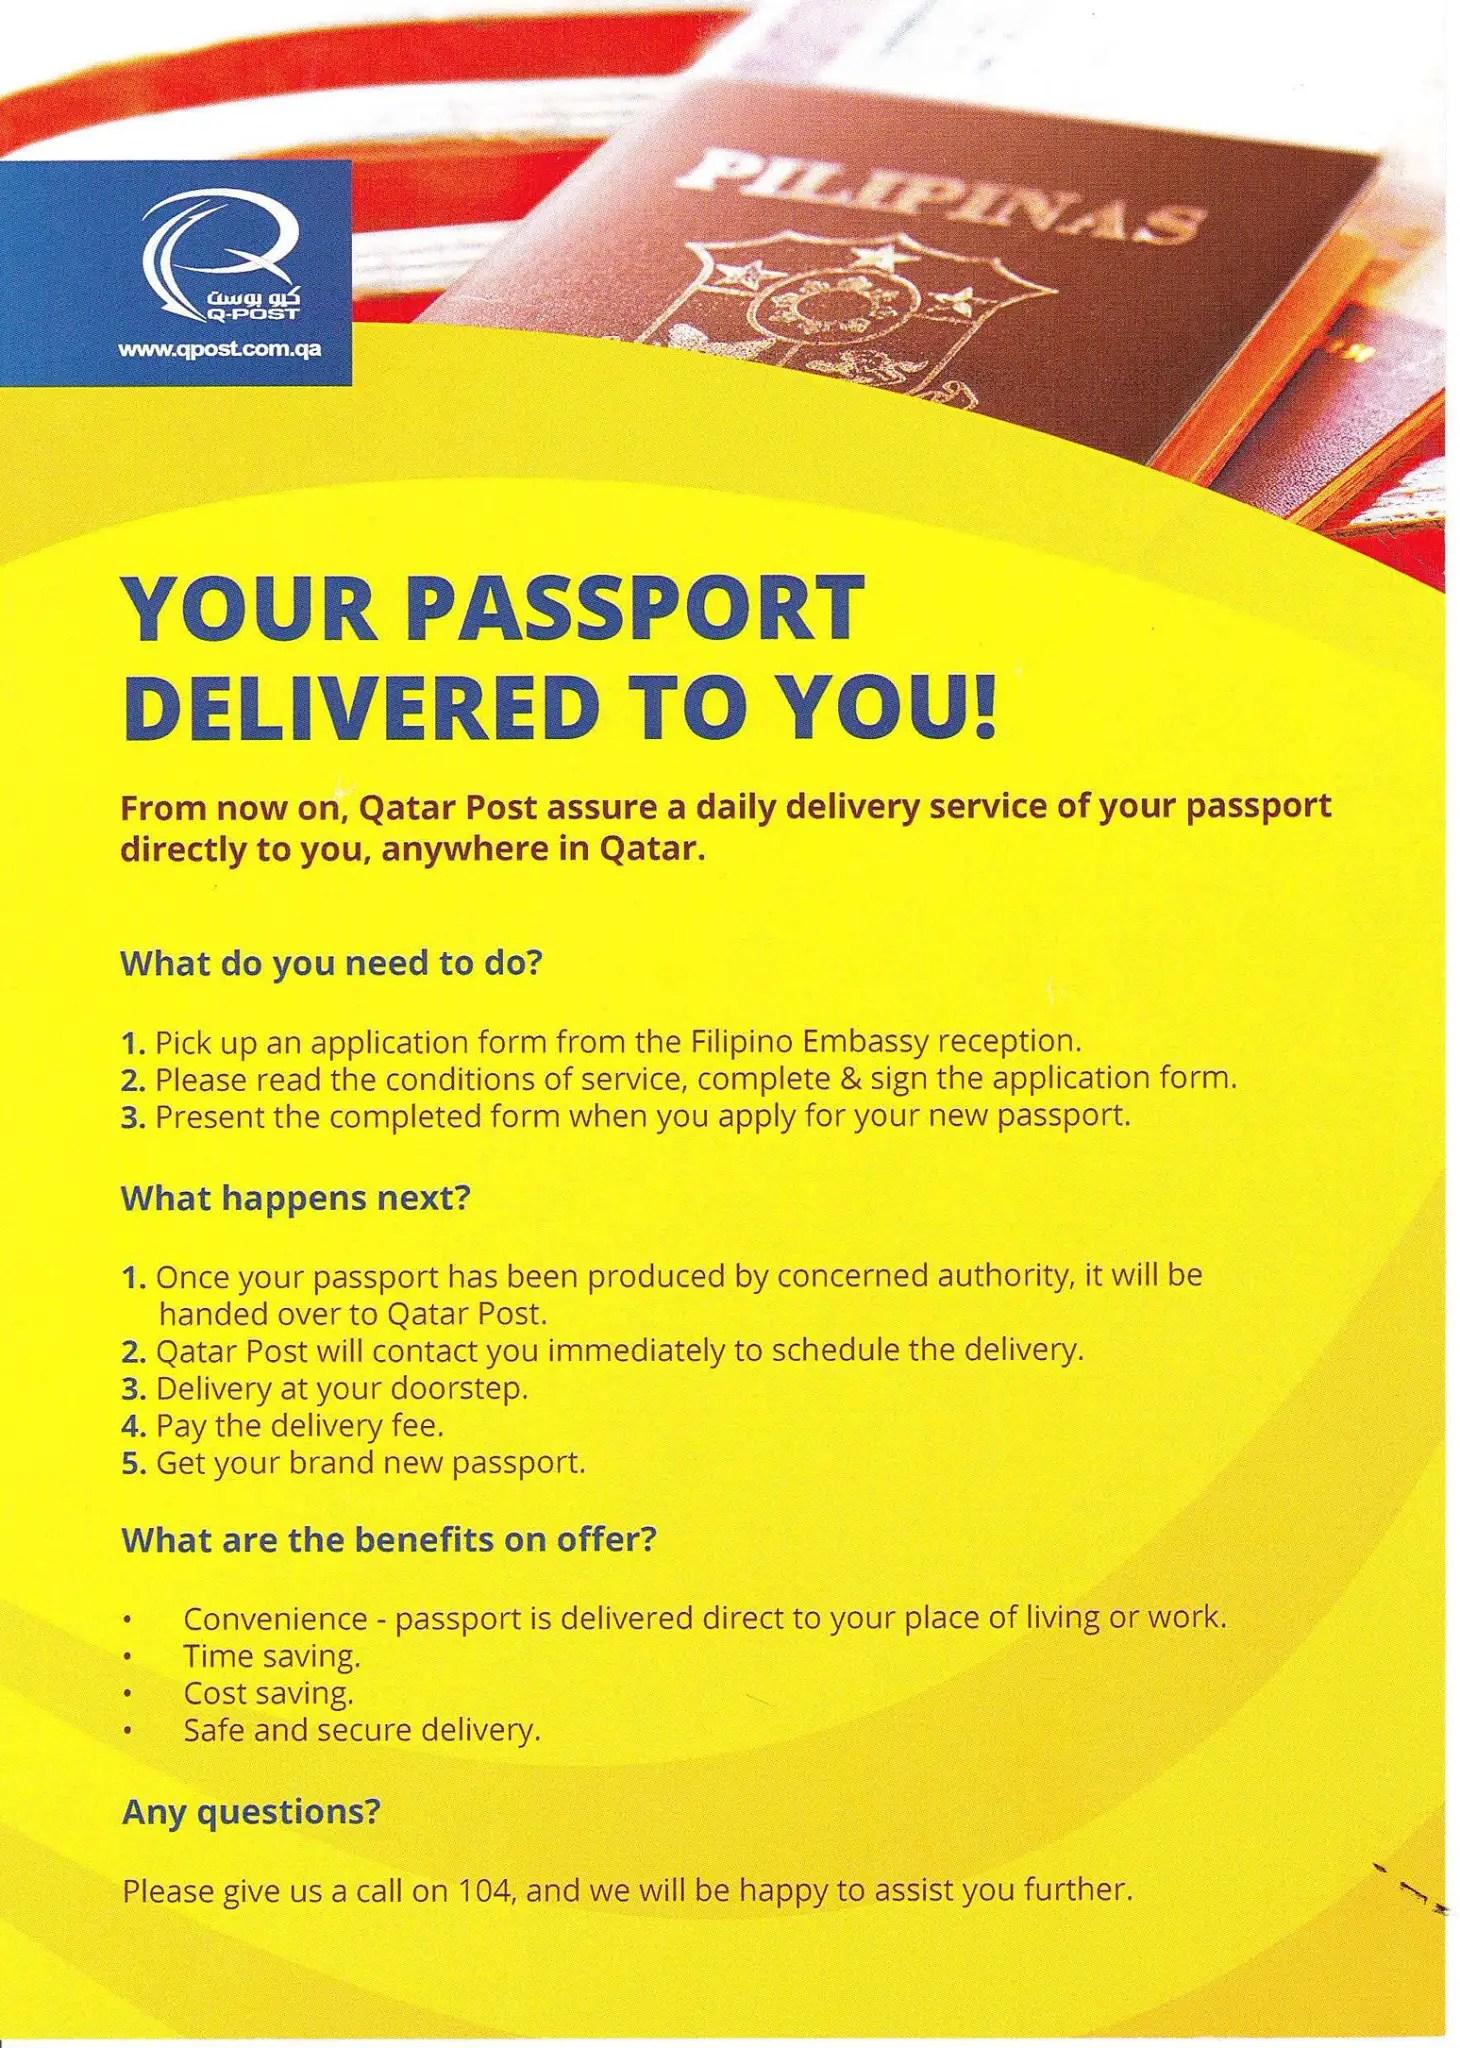 How to Renew your Philippine Passport in Qatar | Qatar OFW